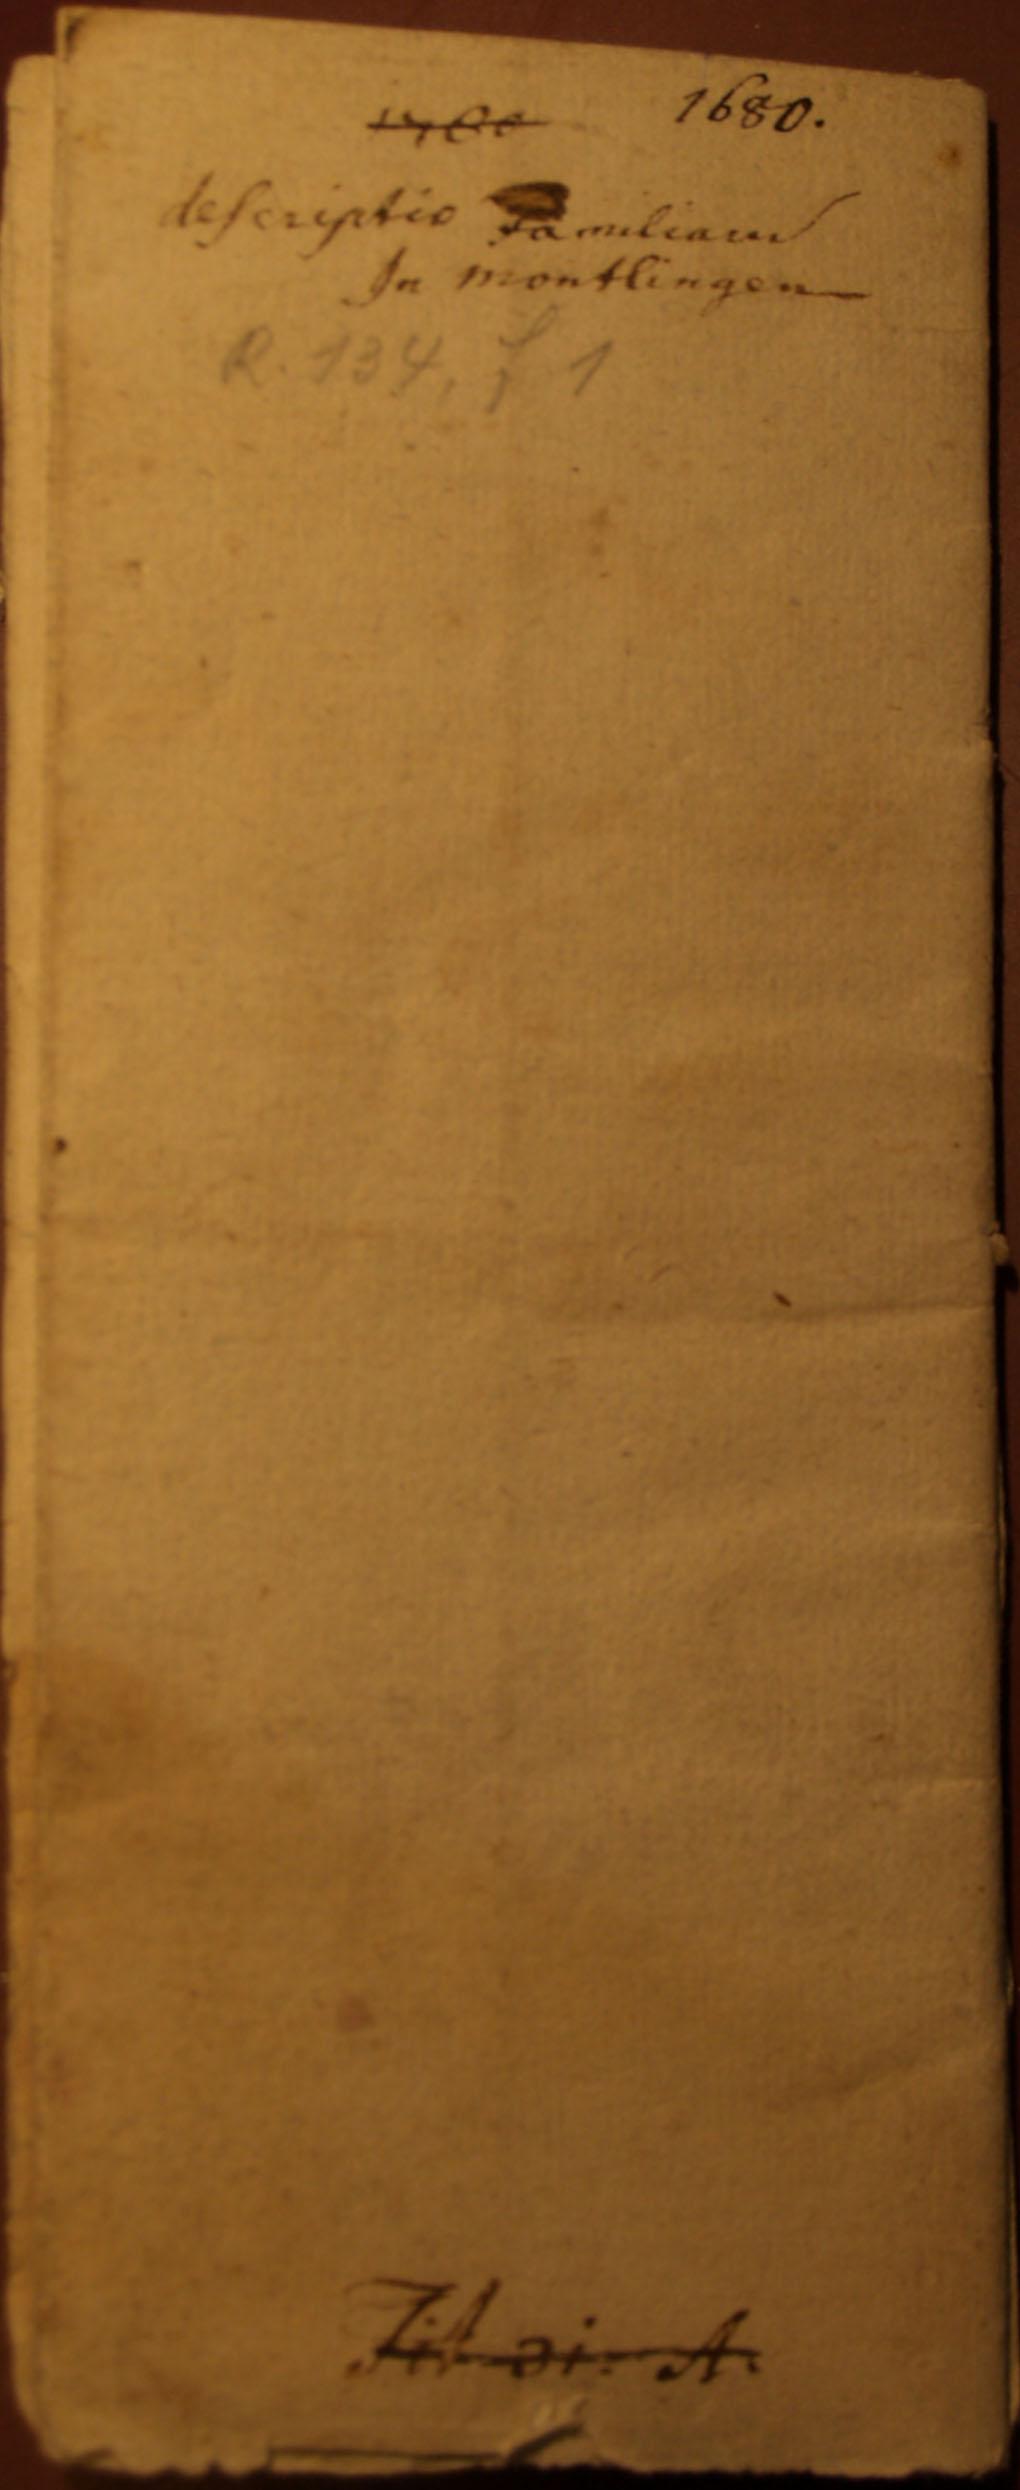 Familienbuch Montlingen, Seite 70